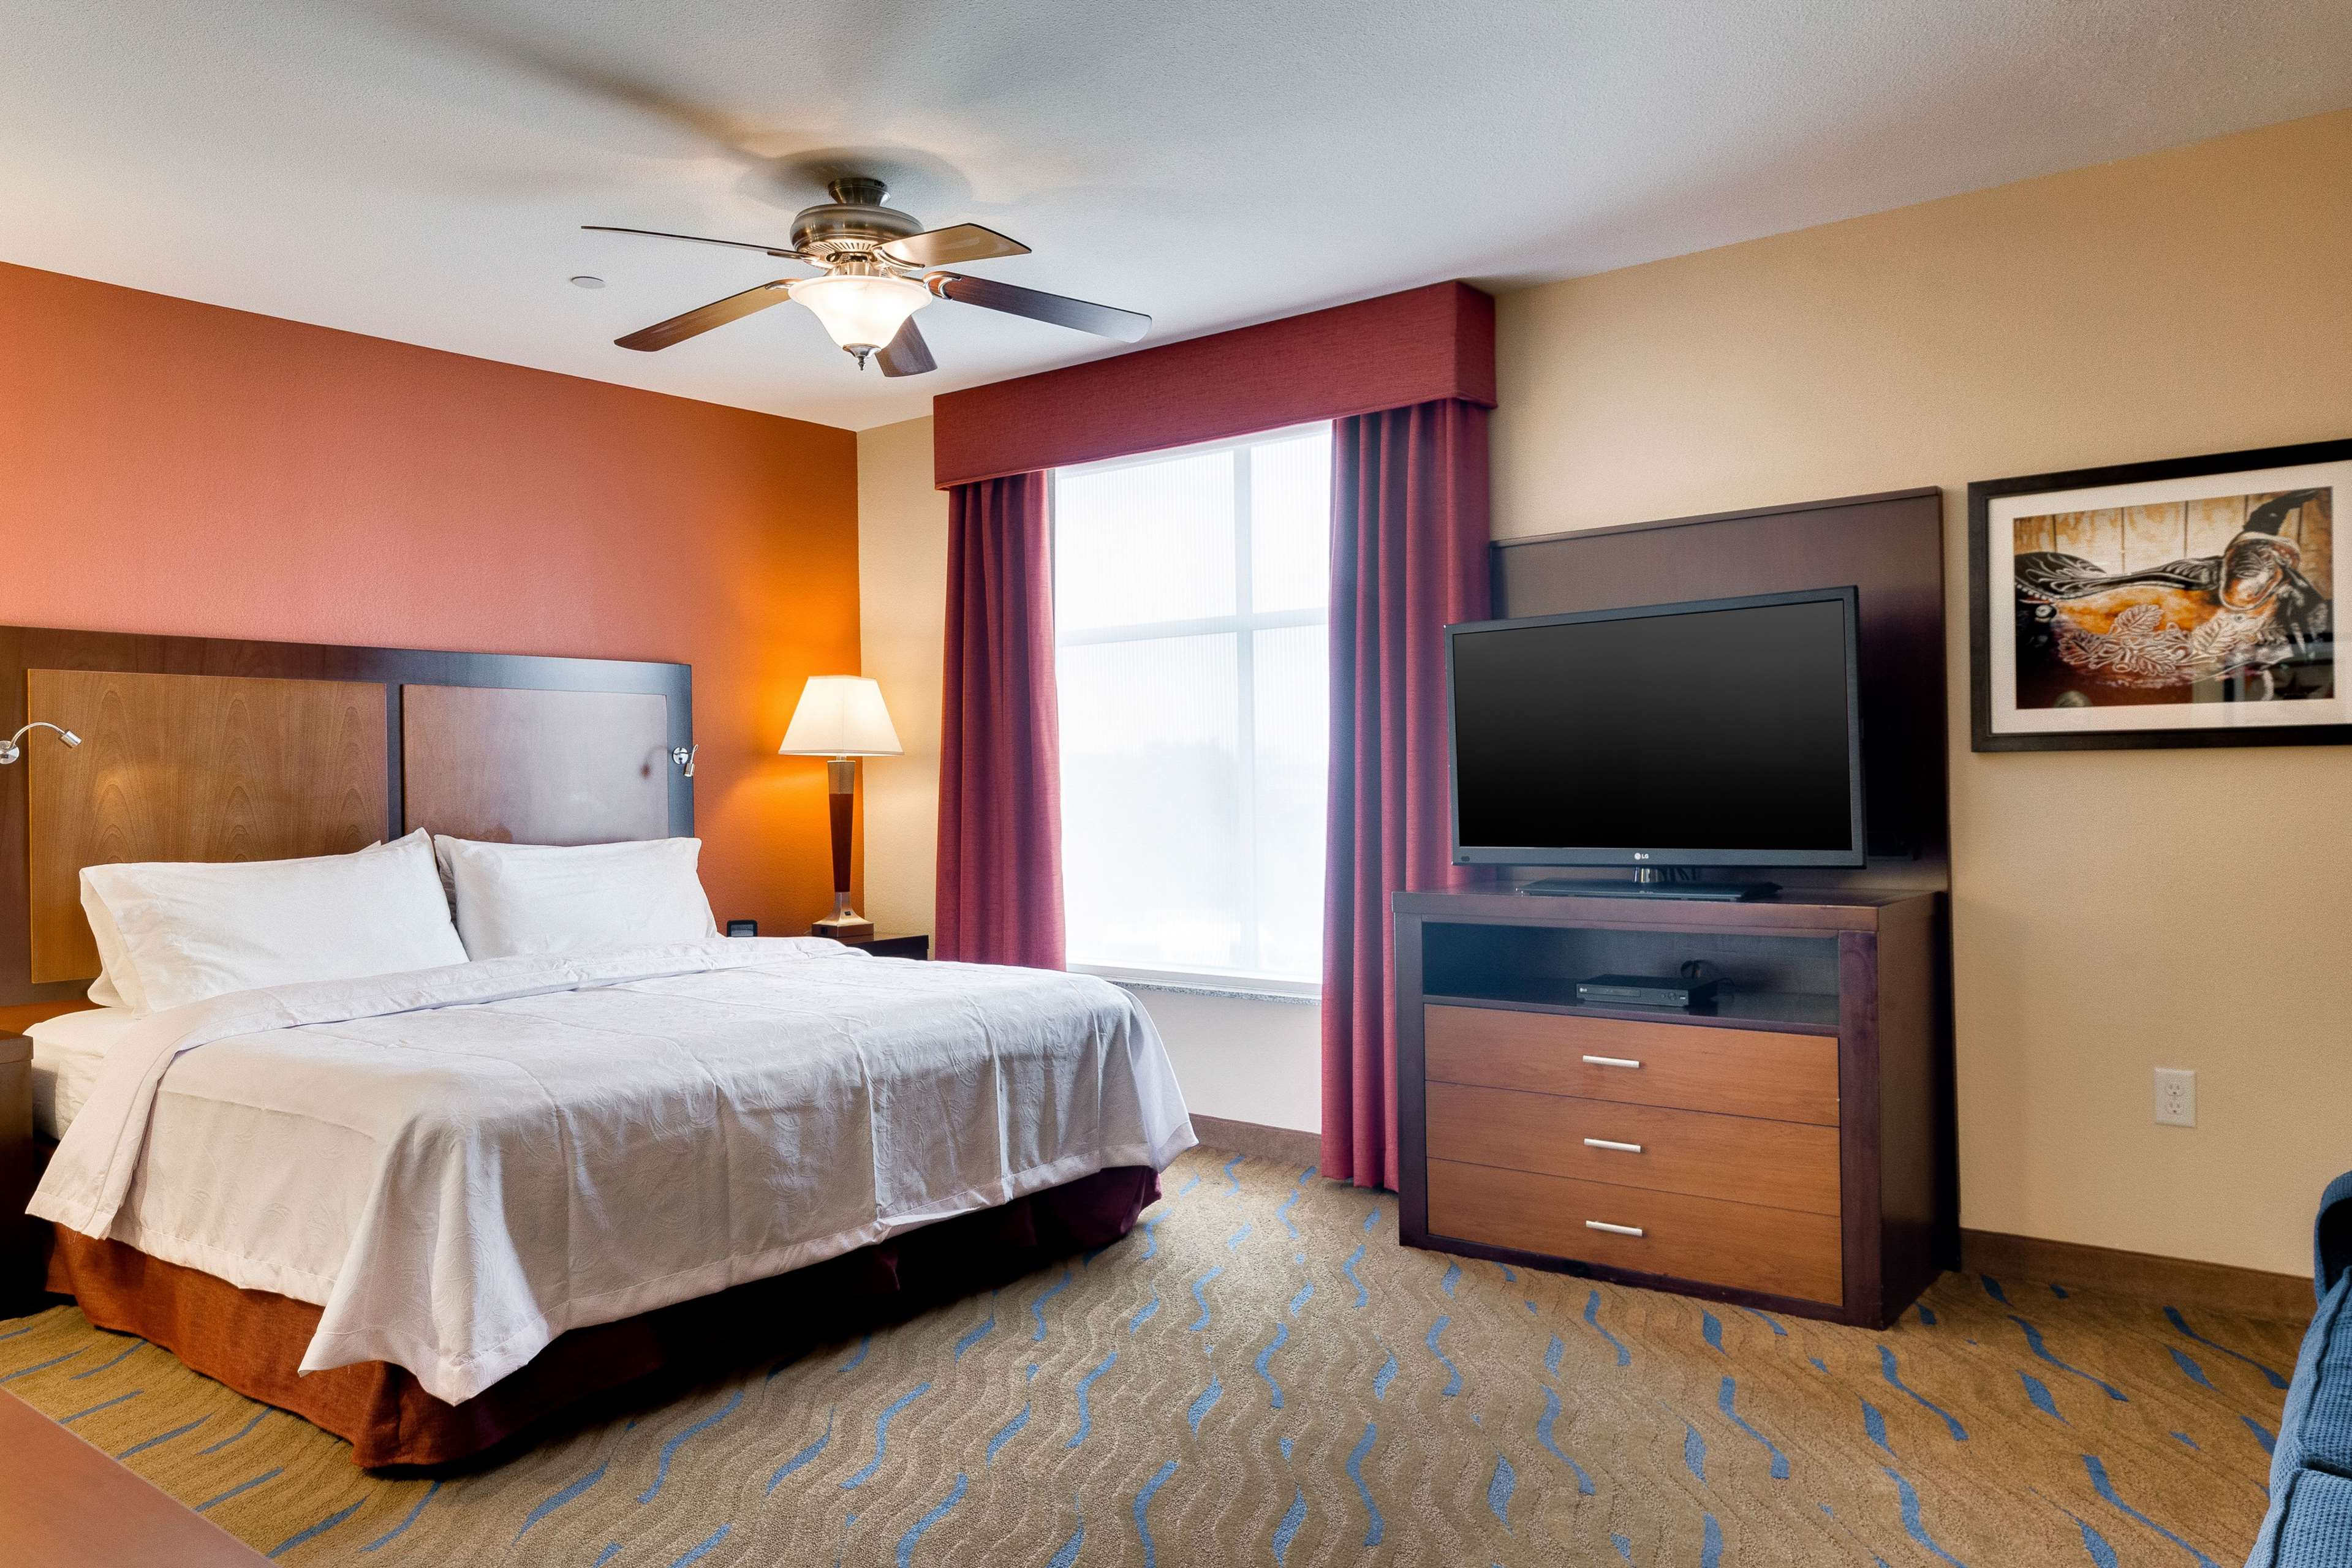 Homewood Suites by Hilton Fort Worth - Medical Center, TX image 12